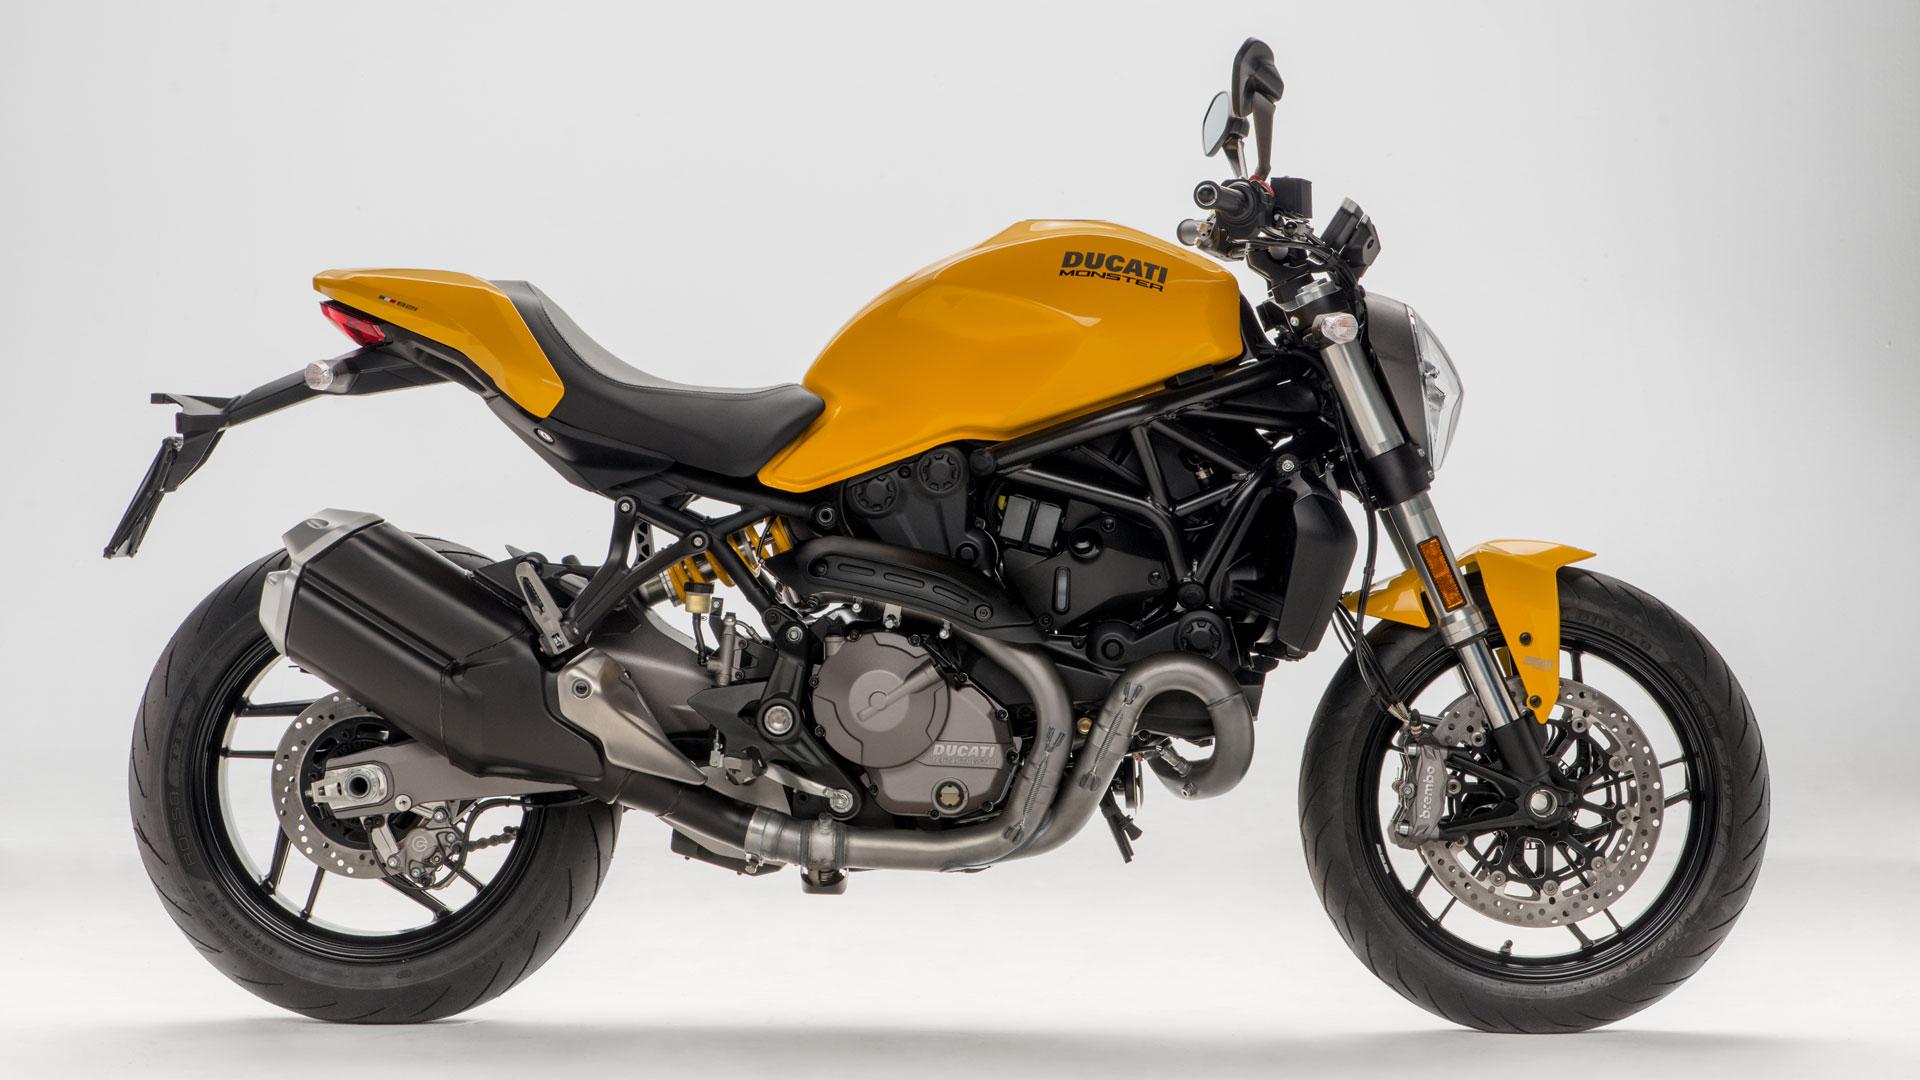 Ducati Monster 821 U2013 Naked Motorcyclesducati. Download Image 1920 X 1080